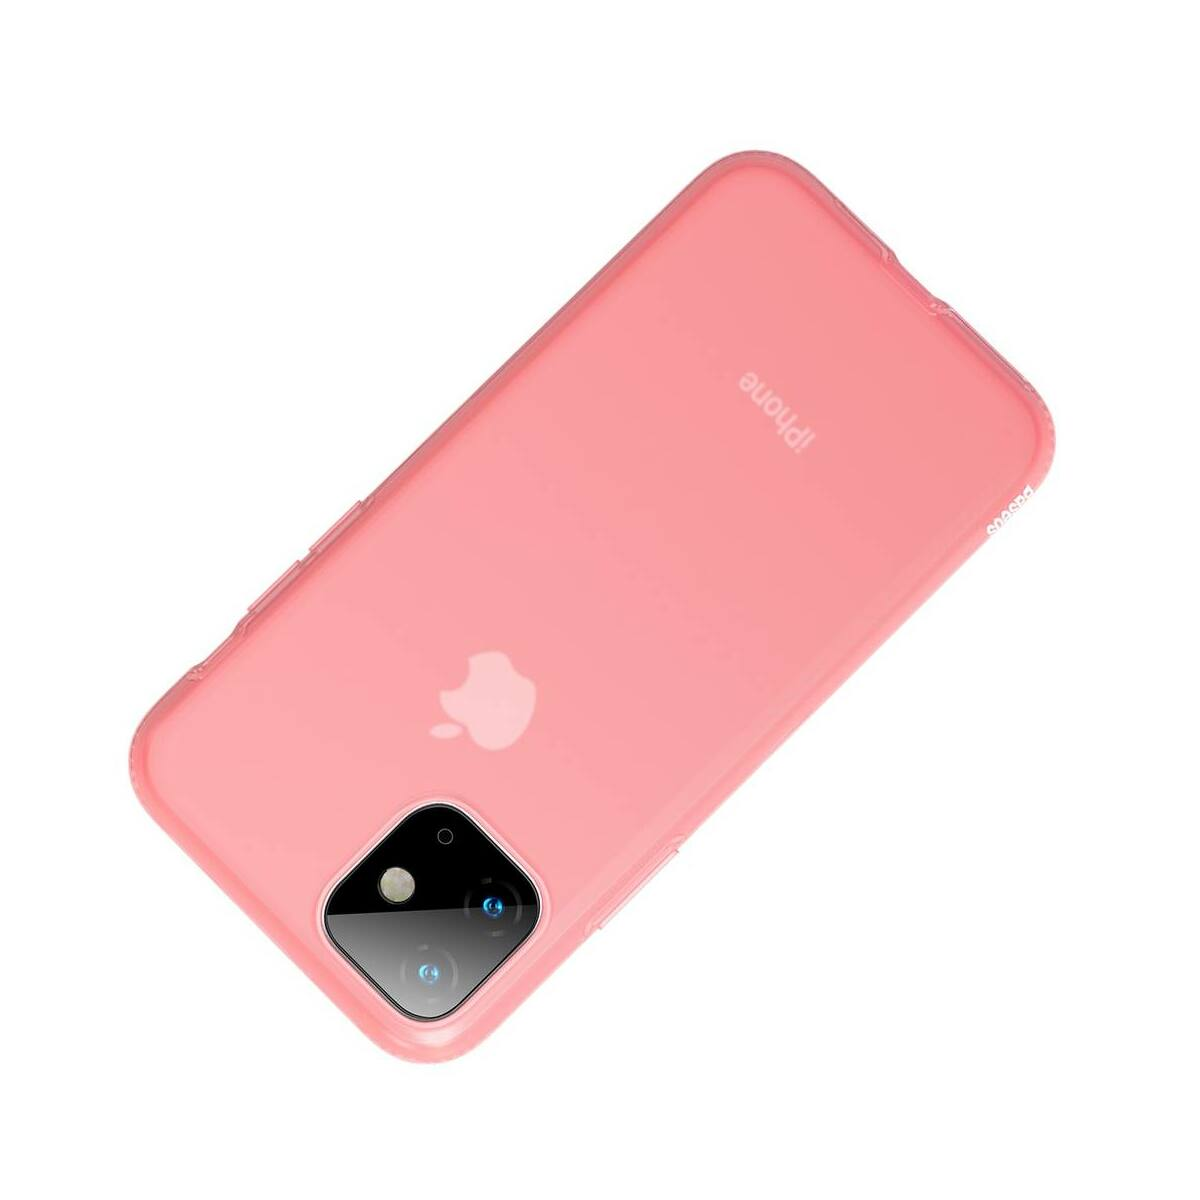 Baseus iPhone 11 tok, Jelly Liquid Silica Gel Protective, átlátszó piros (WIAPIPH61S-GD09)